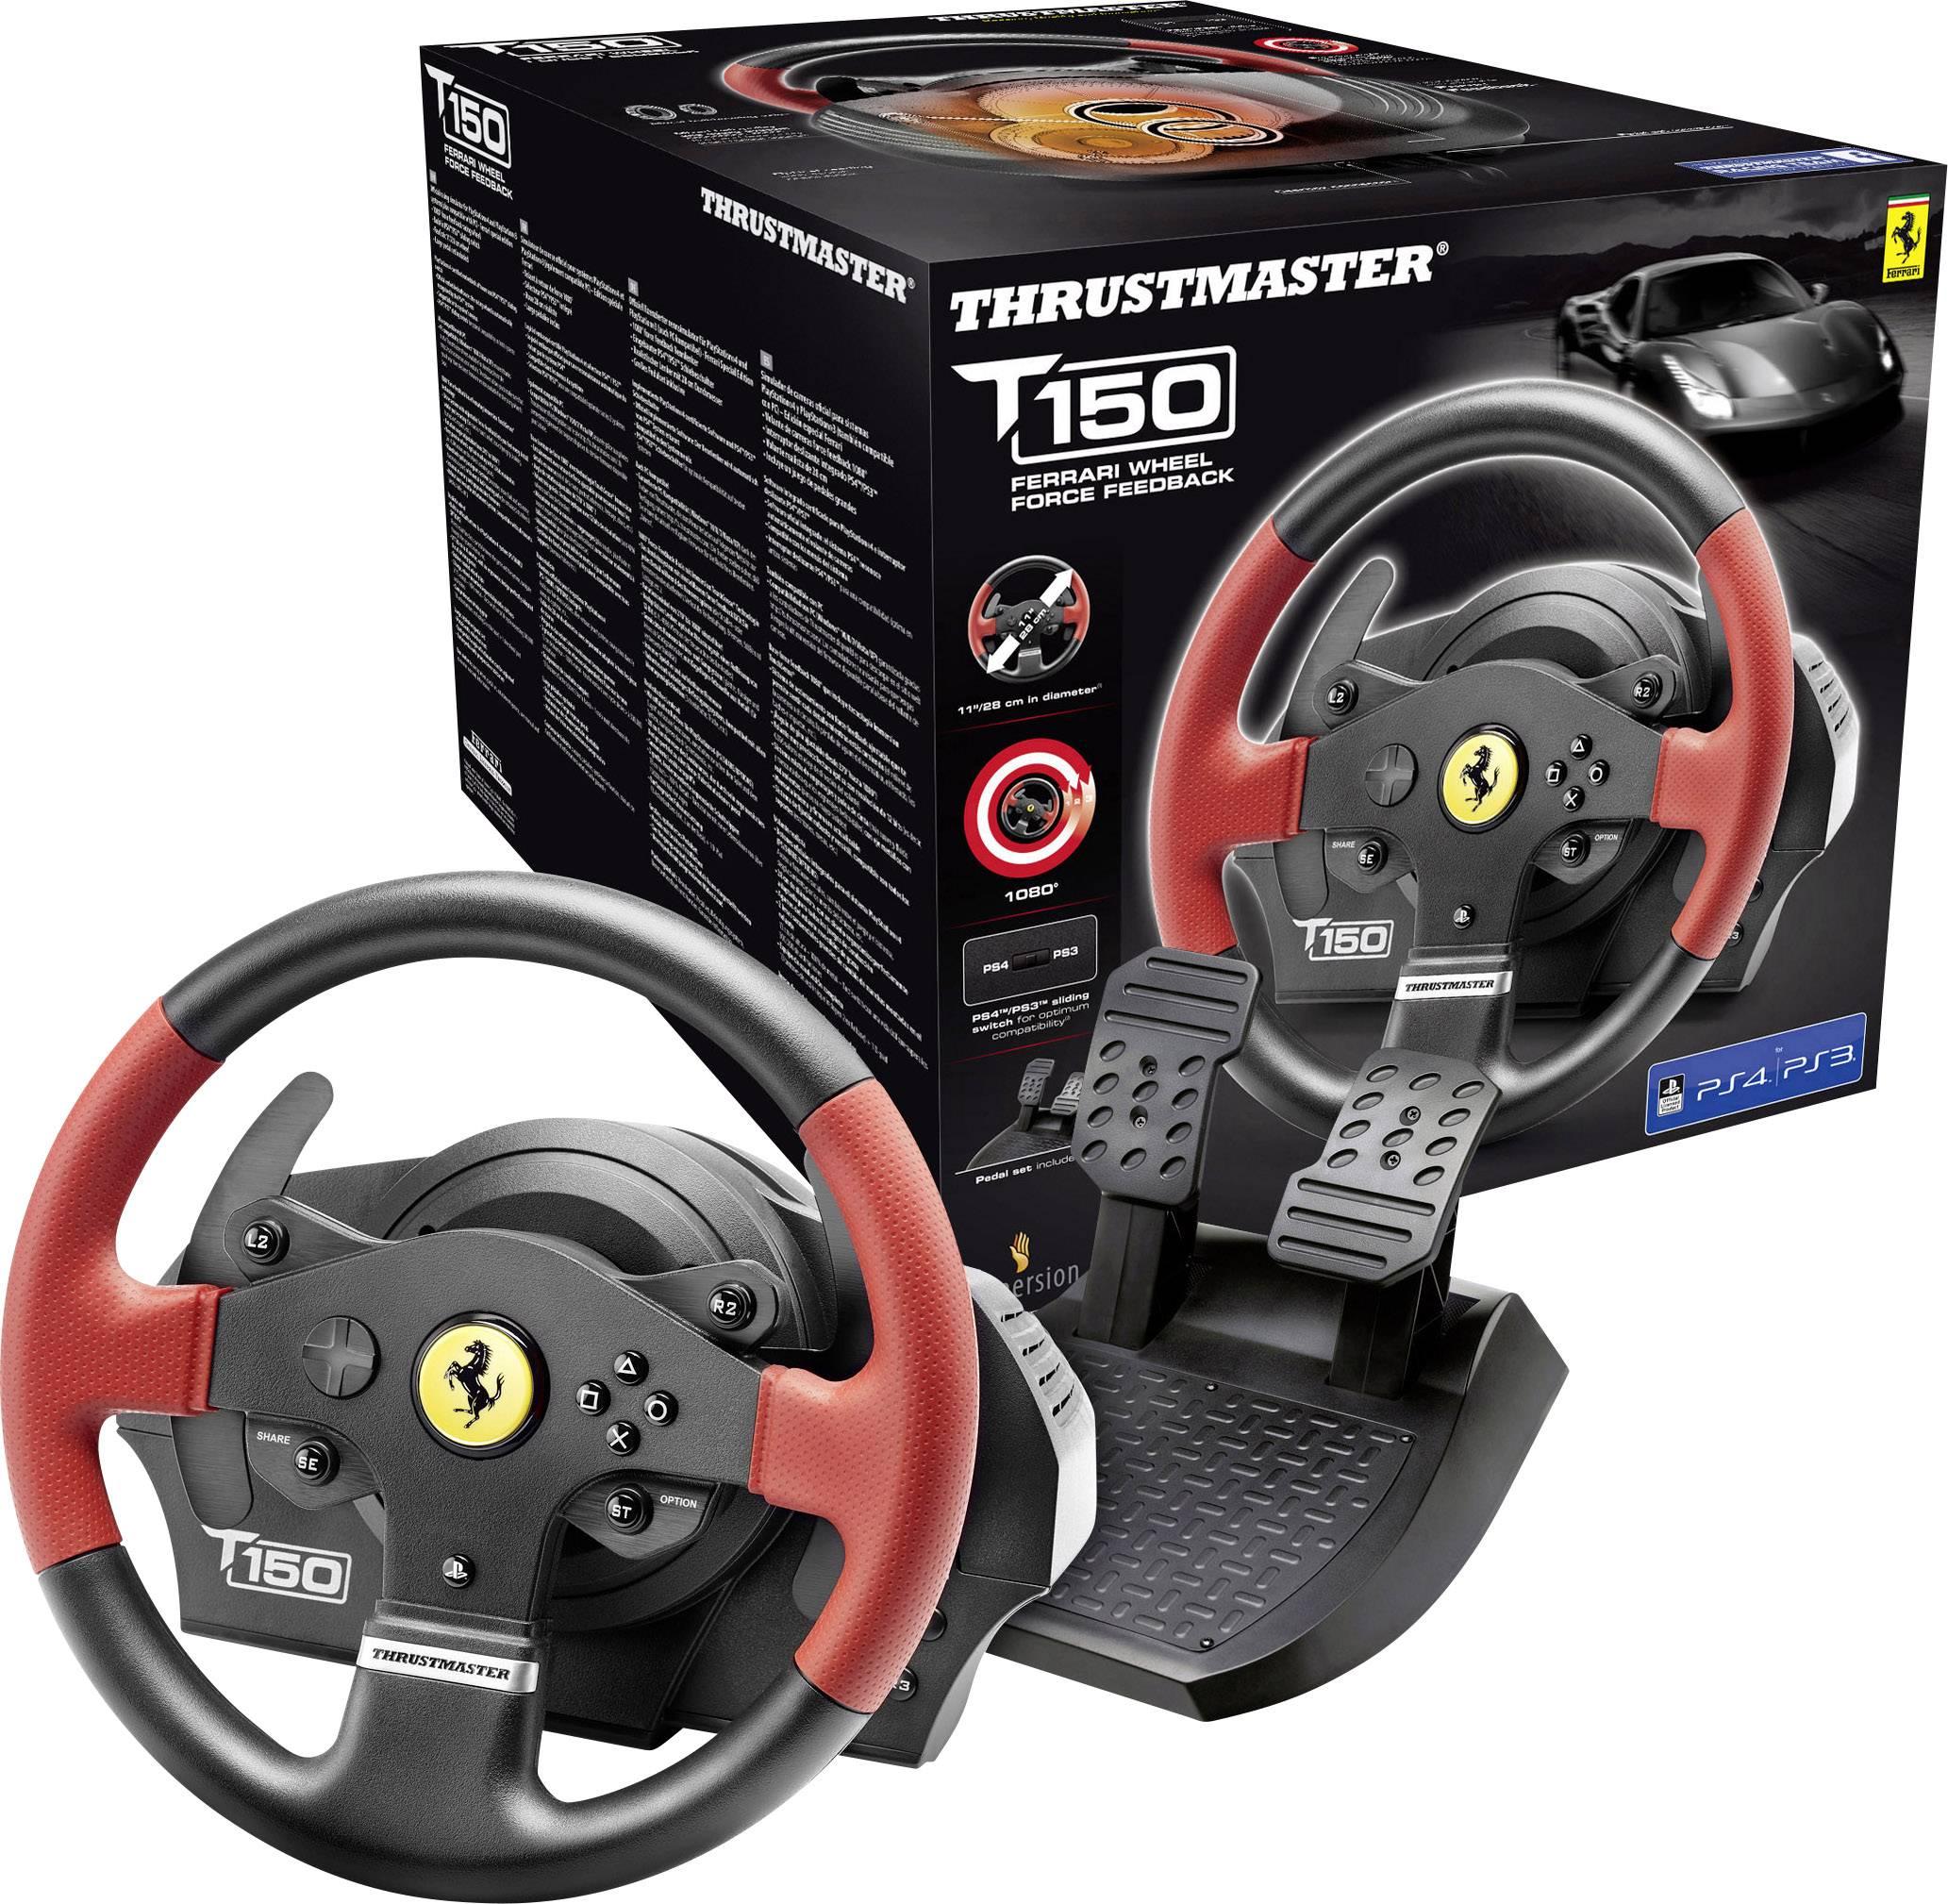 Volant Thrustmaster T150 Ferrari Wheel Force Feedback USB 2.0 PC, PlayStation 3, PlayStation 4 černá/červená vč. pedálů